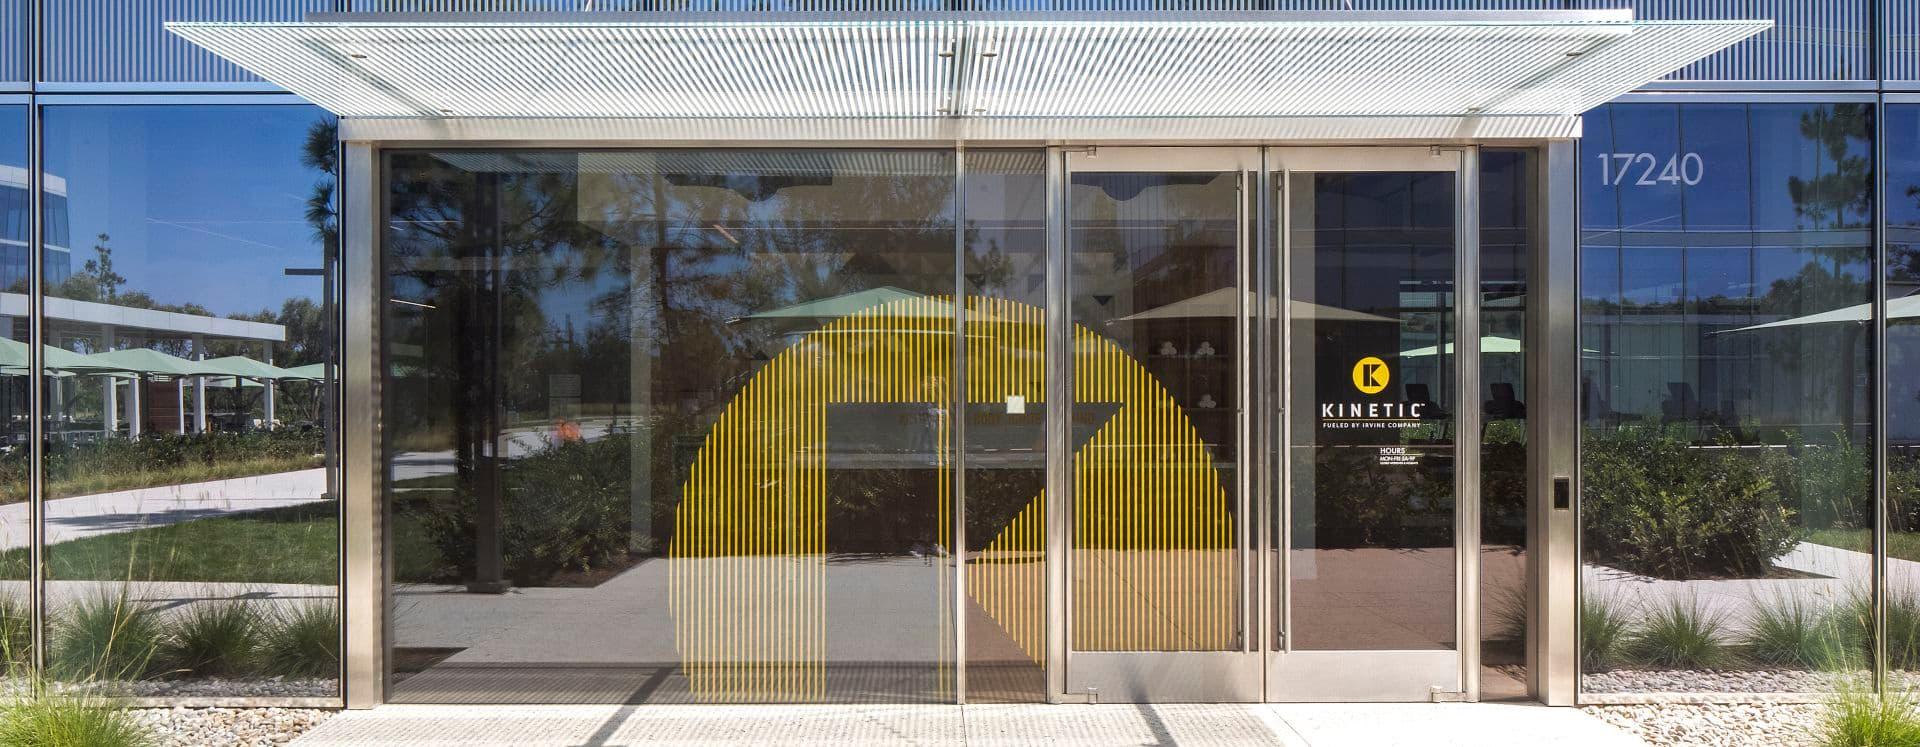 Exterior key shots of Spectrum Terrace office building in Irvine, CA.